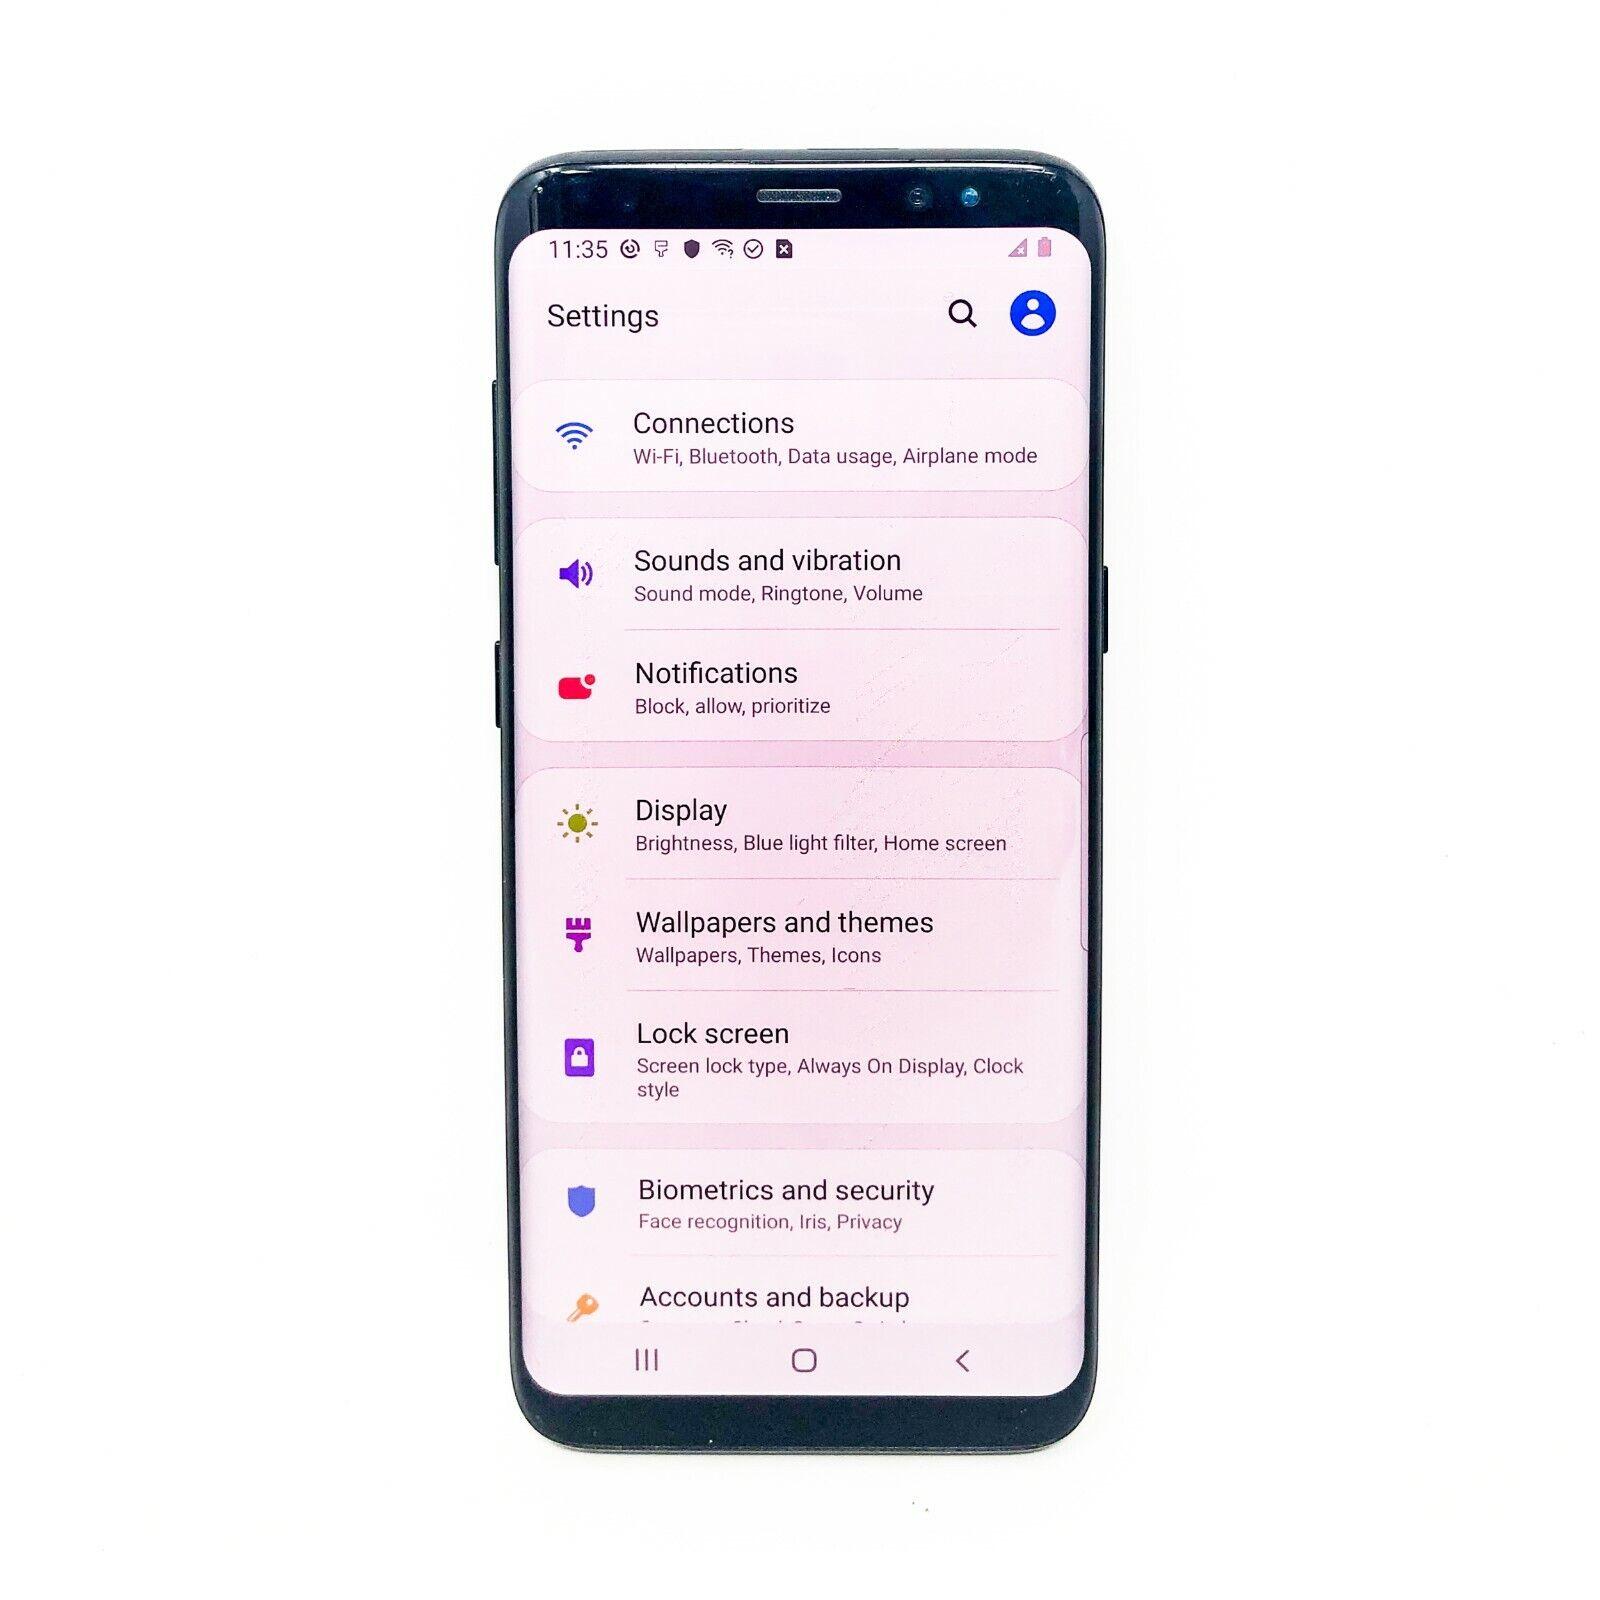 Android Phone - Samsung Galaxy S8 - 64GB - Factory Unlocked - SM-G950U Android - Midnight Black